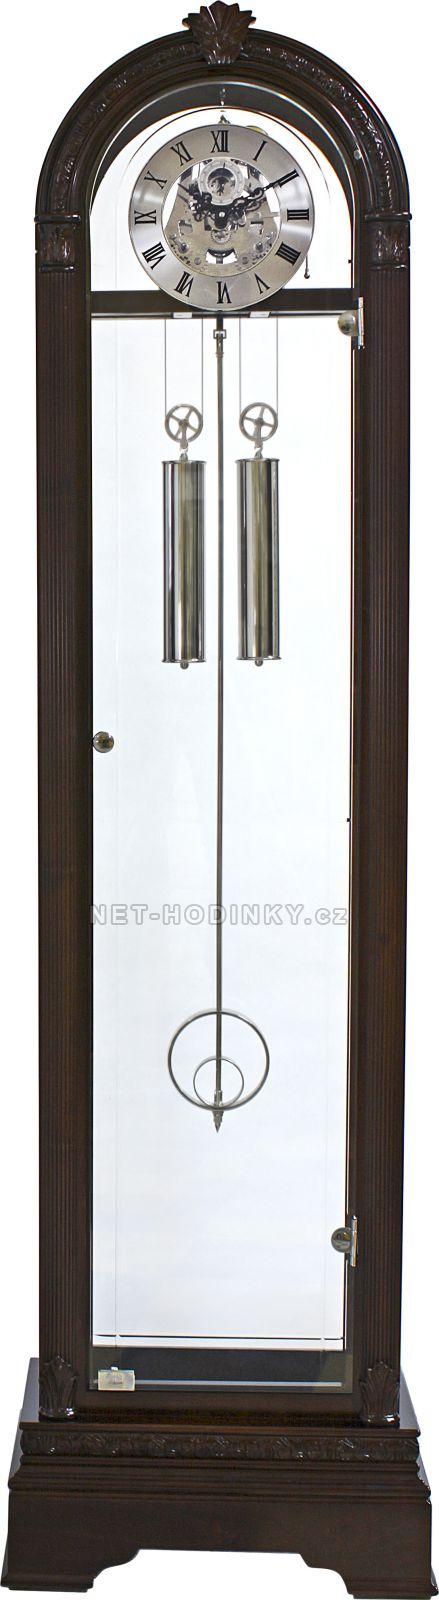 Podlahové hodiny Prim mechanické E08P.3183.01012 54 - tmavé dřevo